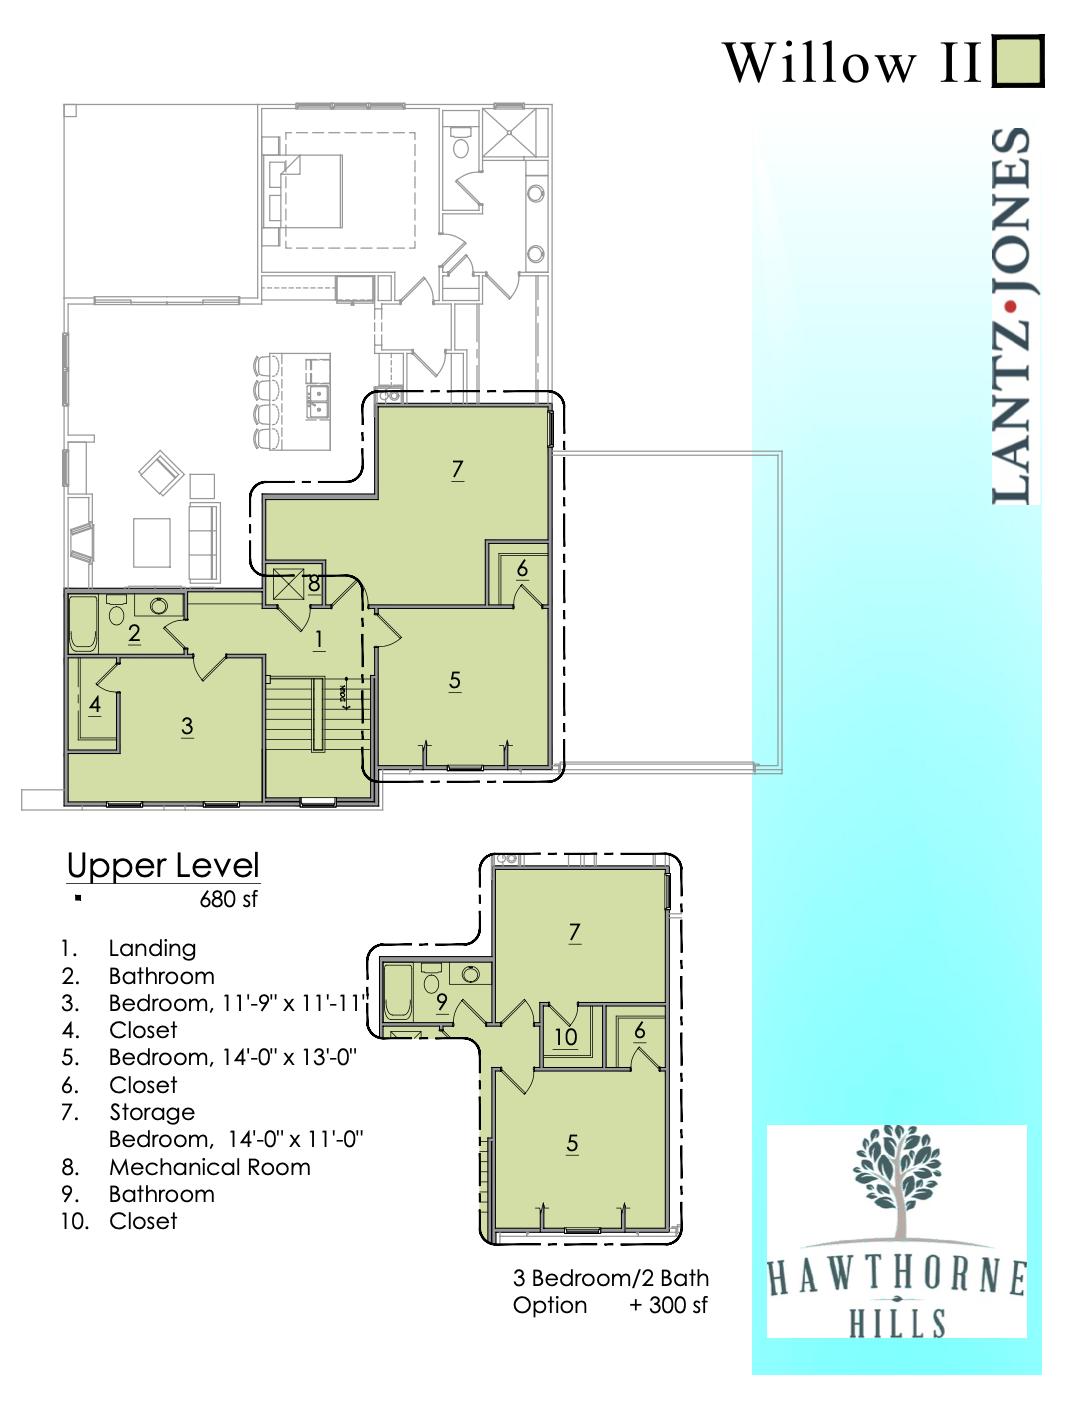 Willow 2 Upper Level